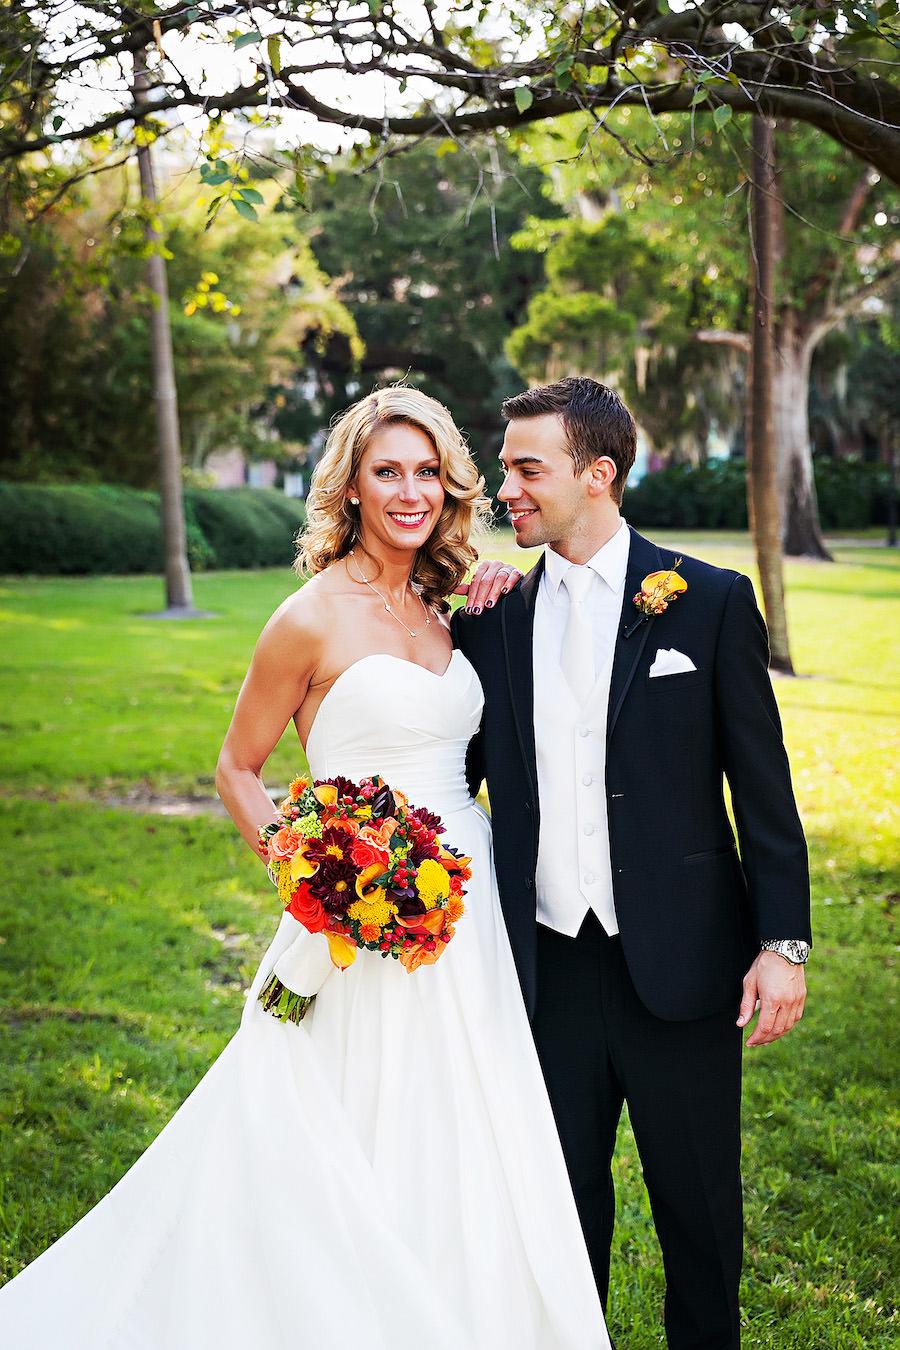 Bride and Groom with Orange, Yellow and Burgundy Wedding Bouquet Wedding Portrait   Tampa Wedding Photographer Limelight Photography